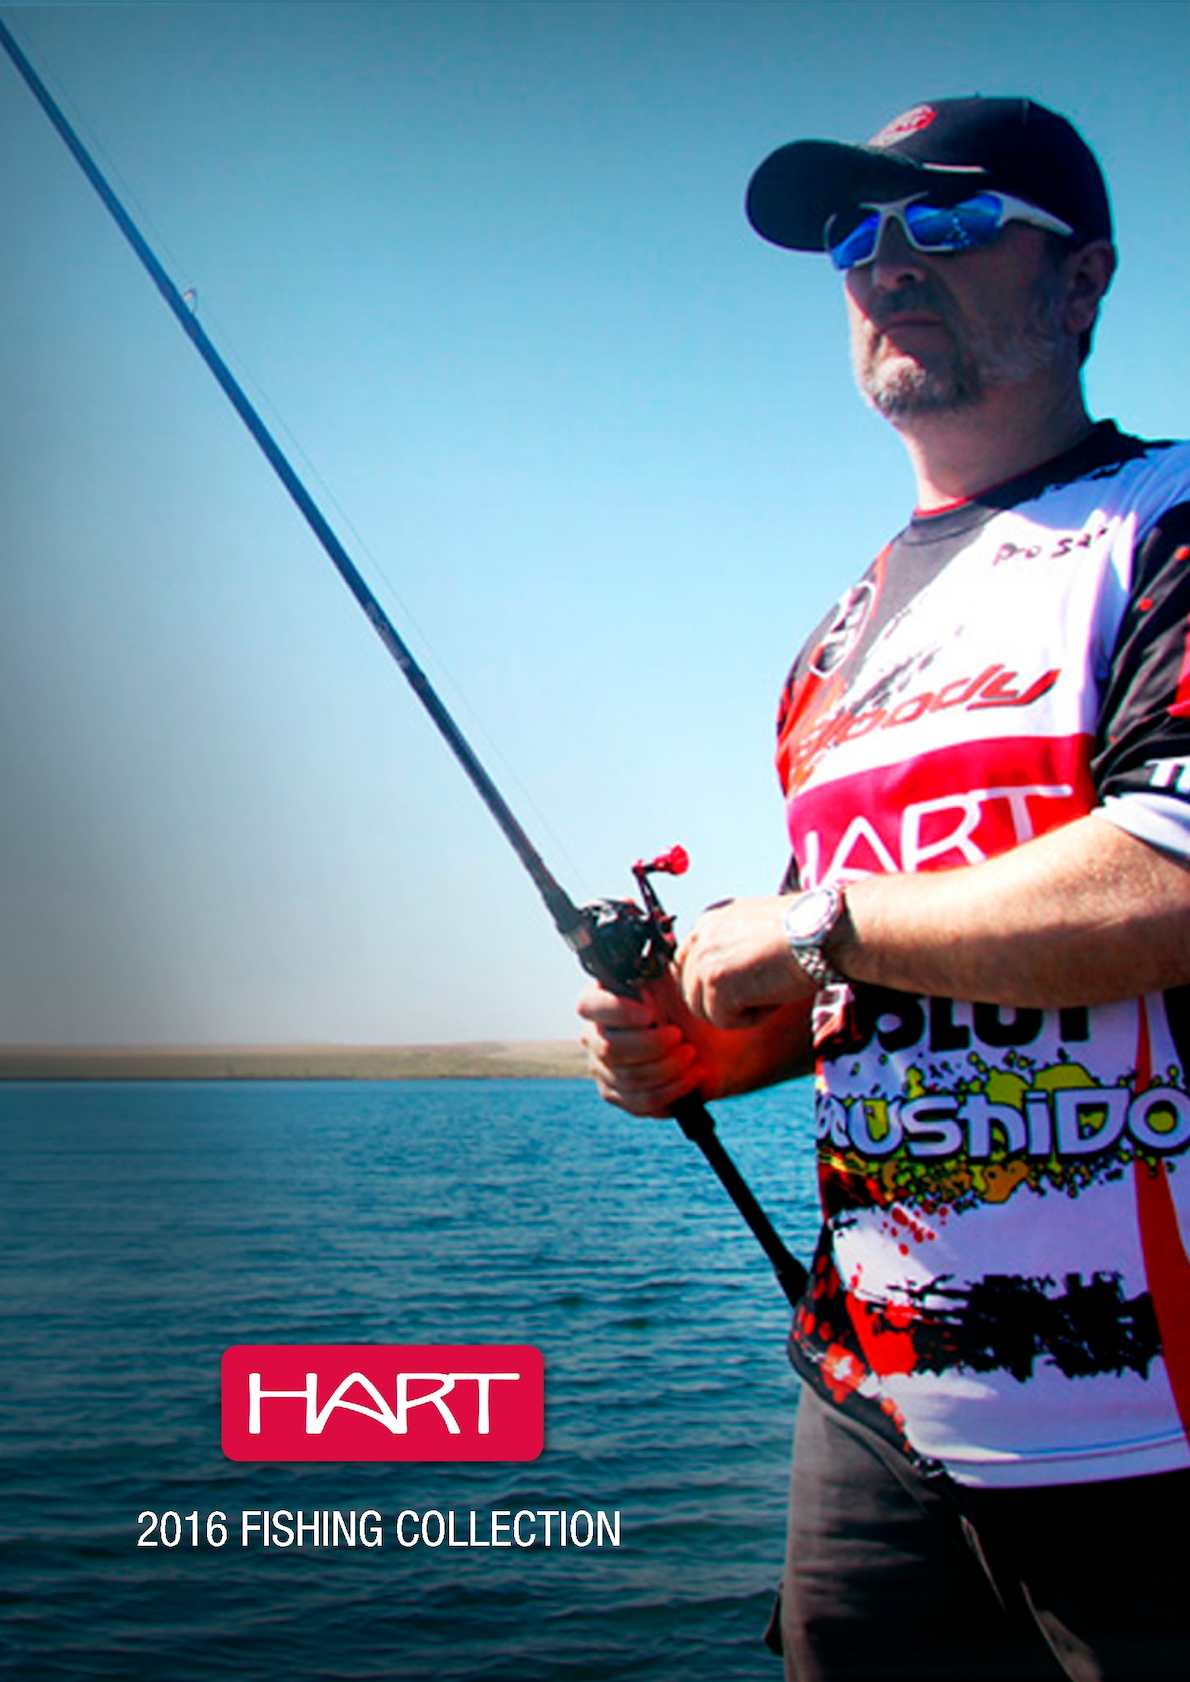 Saltwater fishing  16oz Bullet Jig Florecent Bottom Fishing 2 JIGS